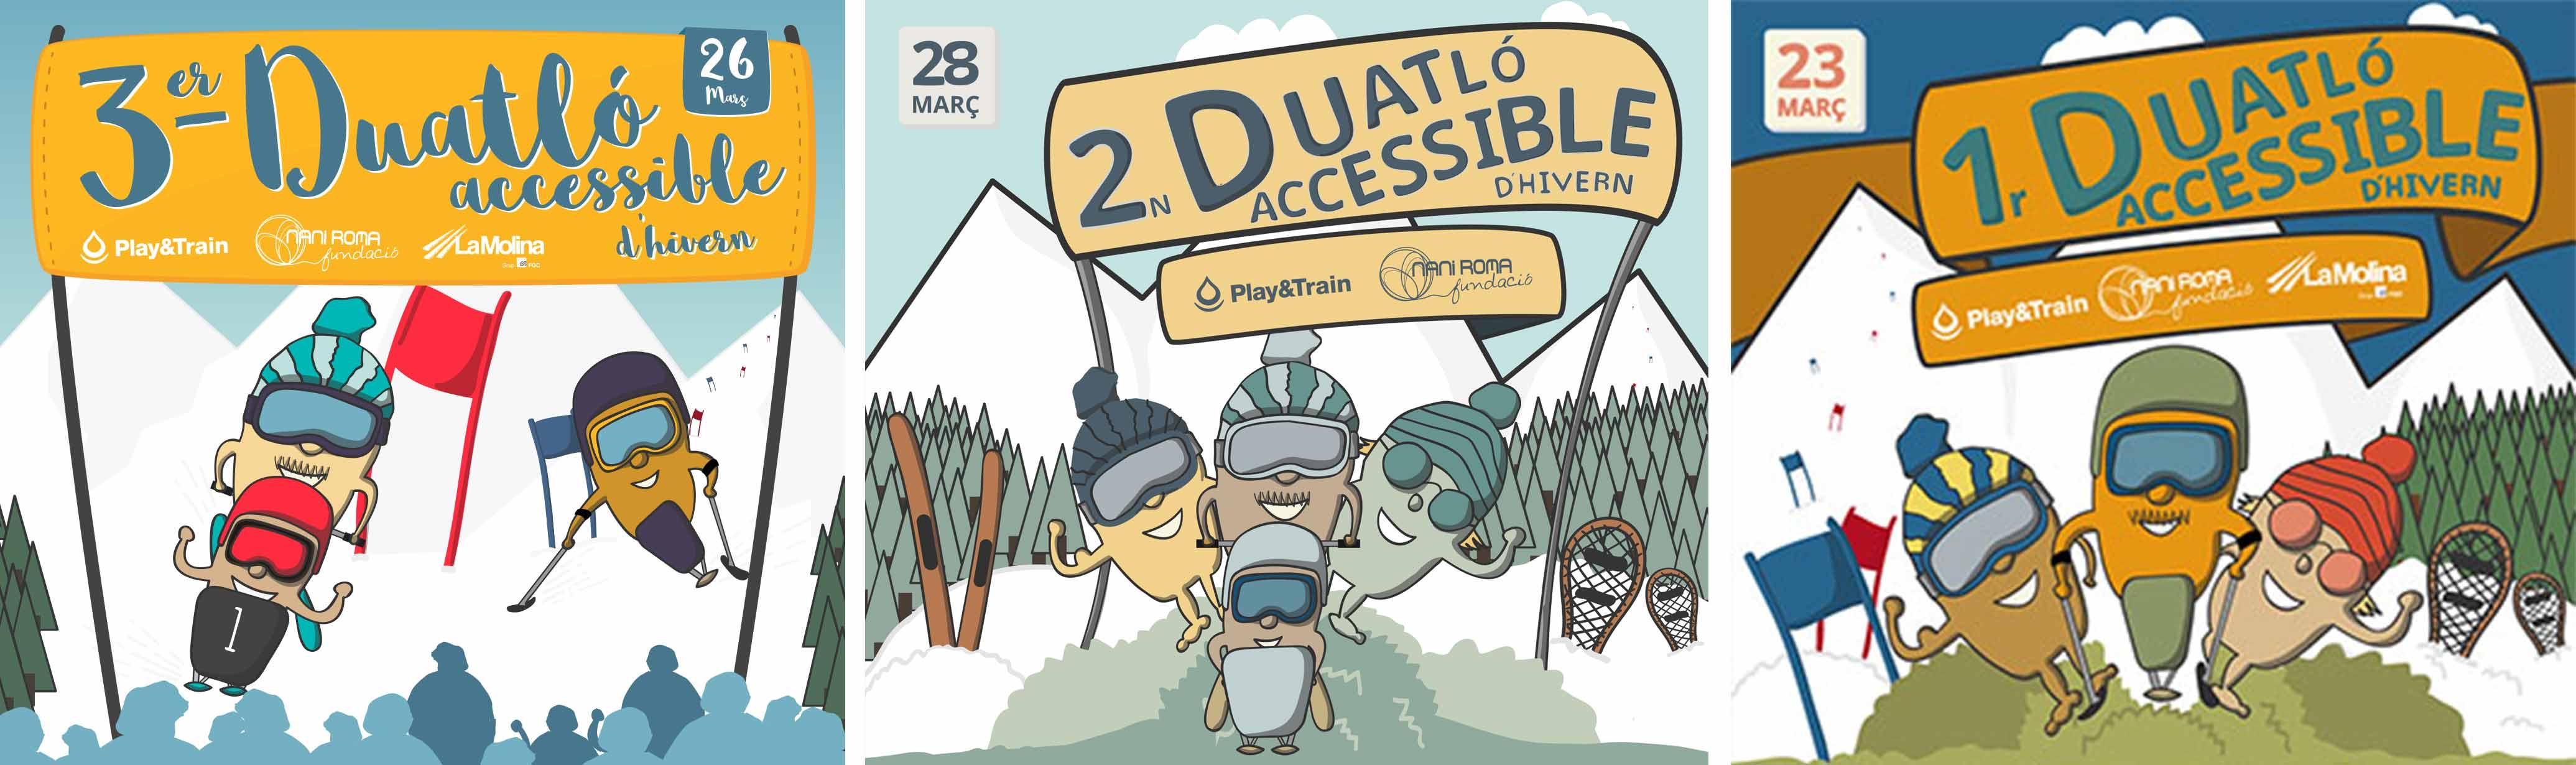 Concurso de Dibujo Duatló 2017